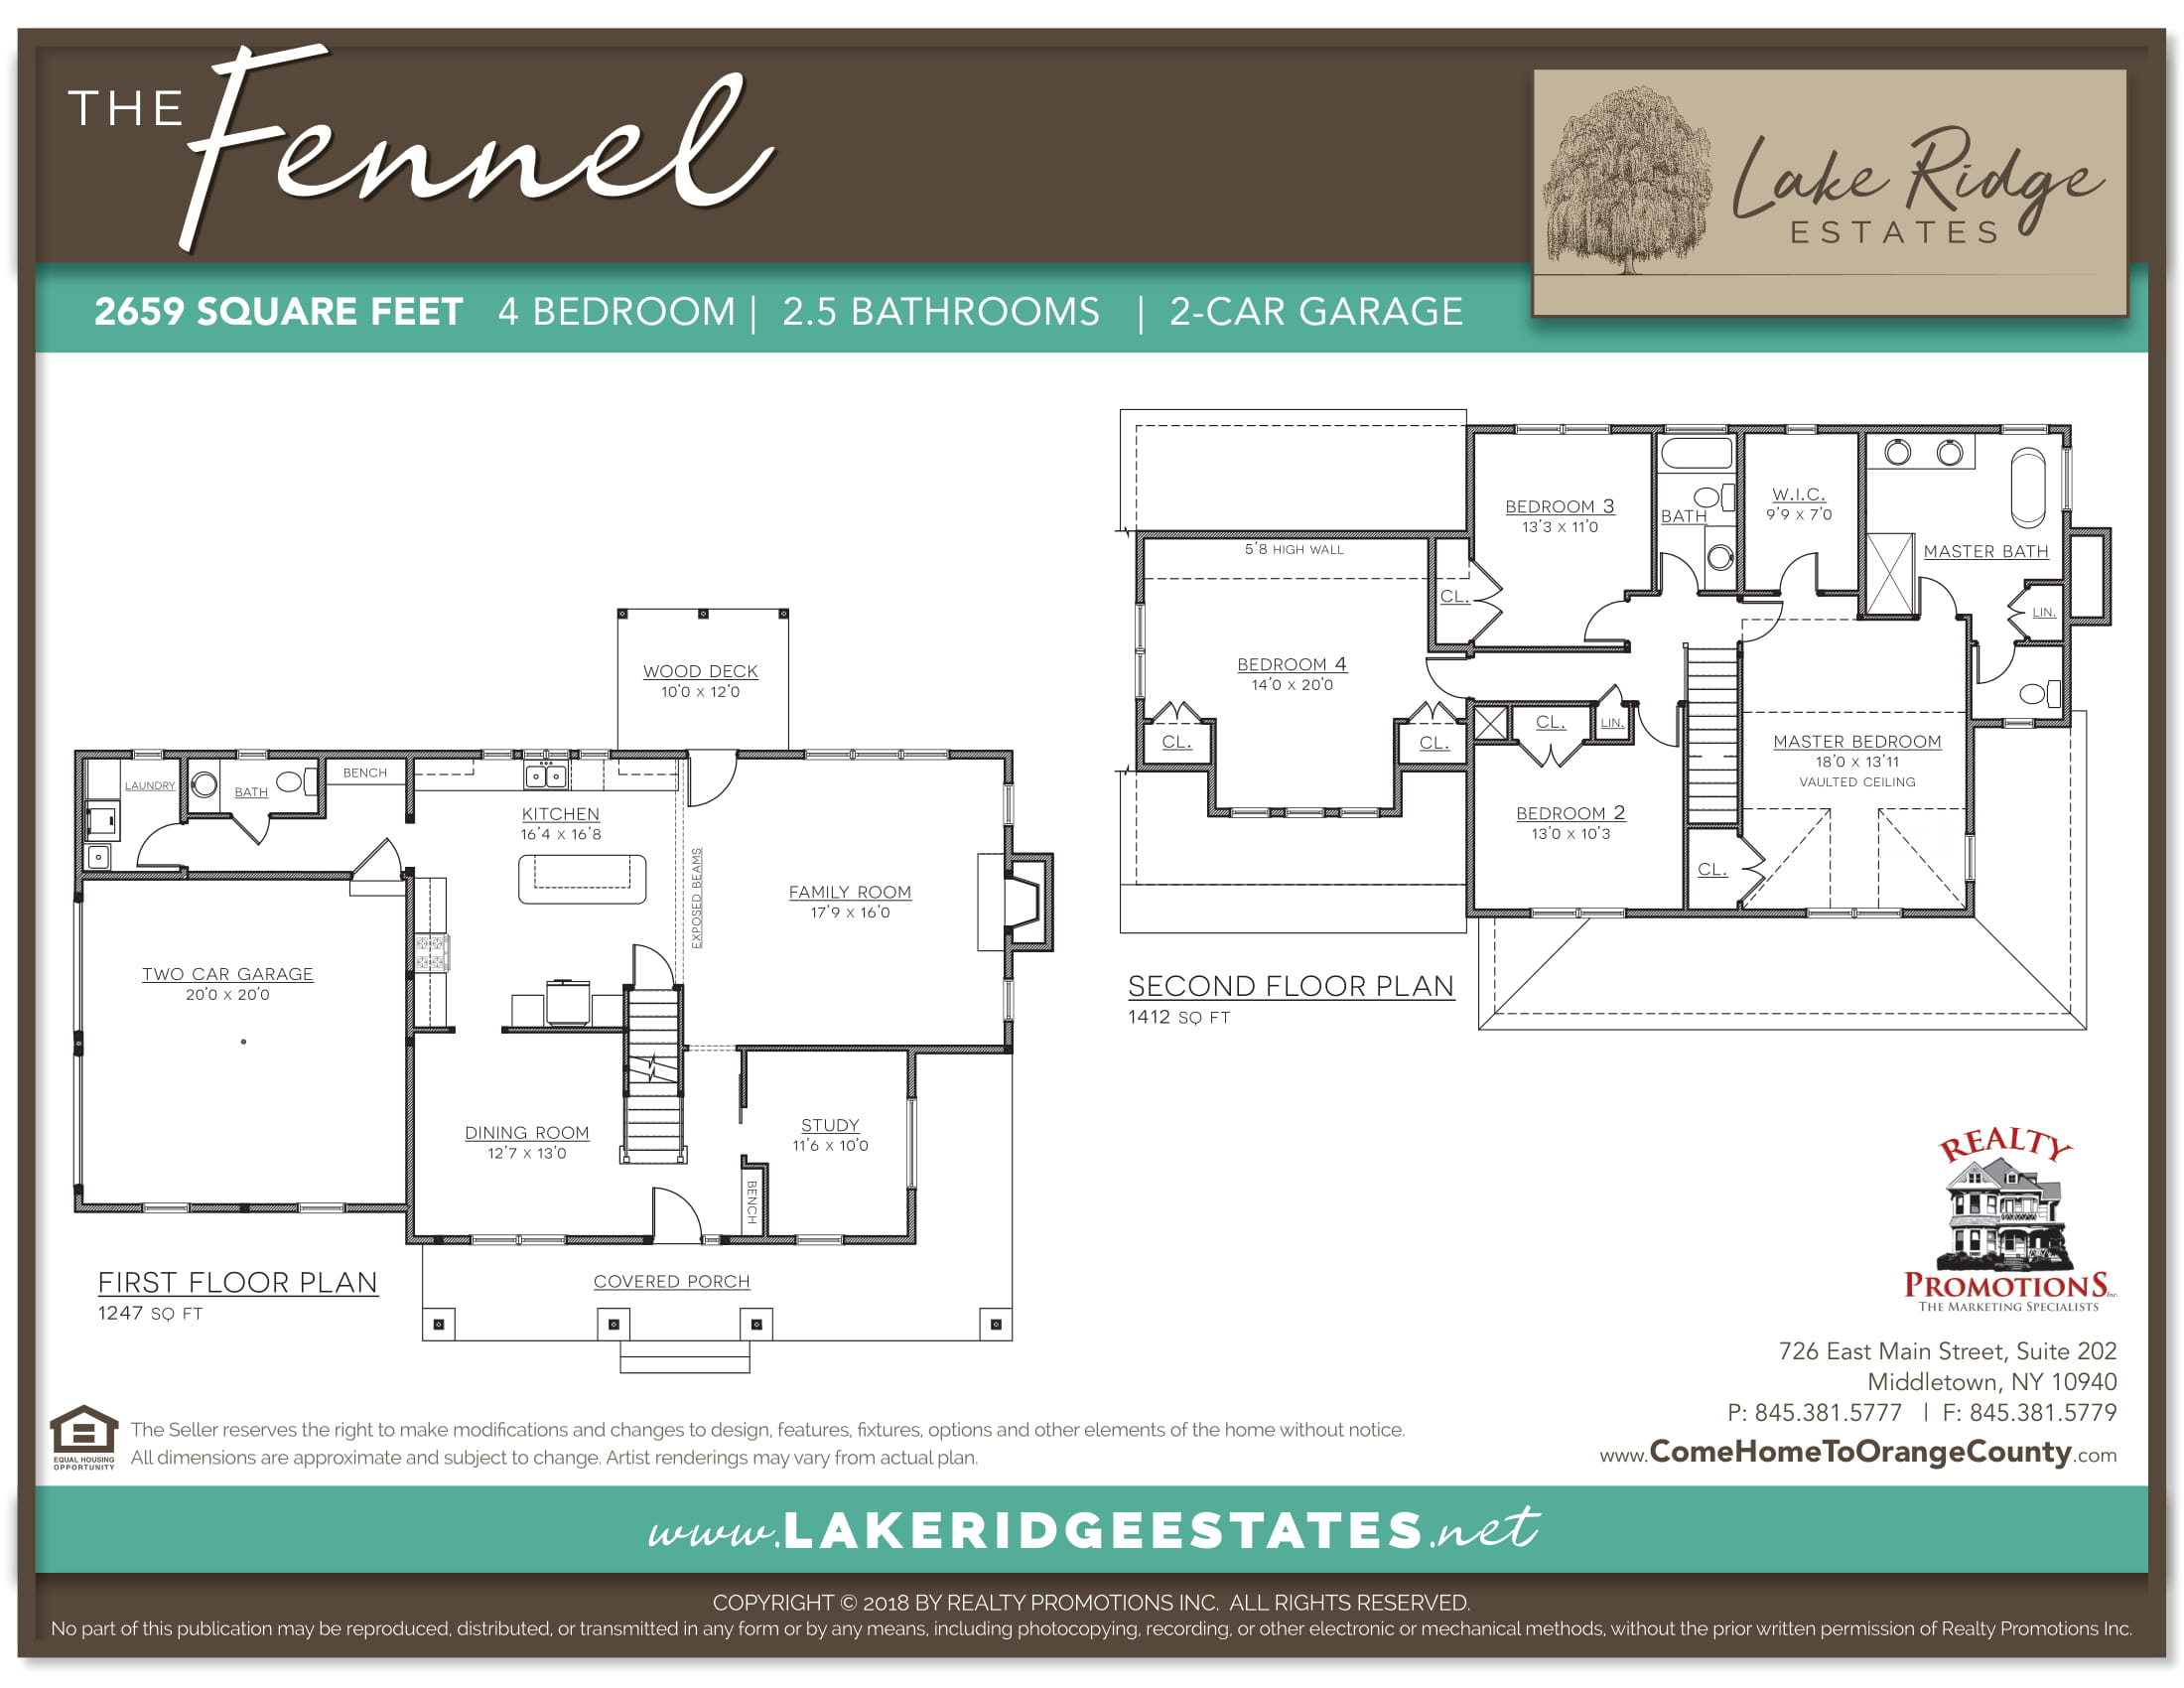 Christopher Ogden Middletown Ny Real Estate Thefennel Lakeridge 1 2